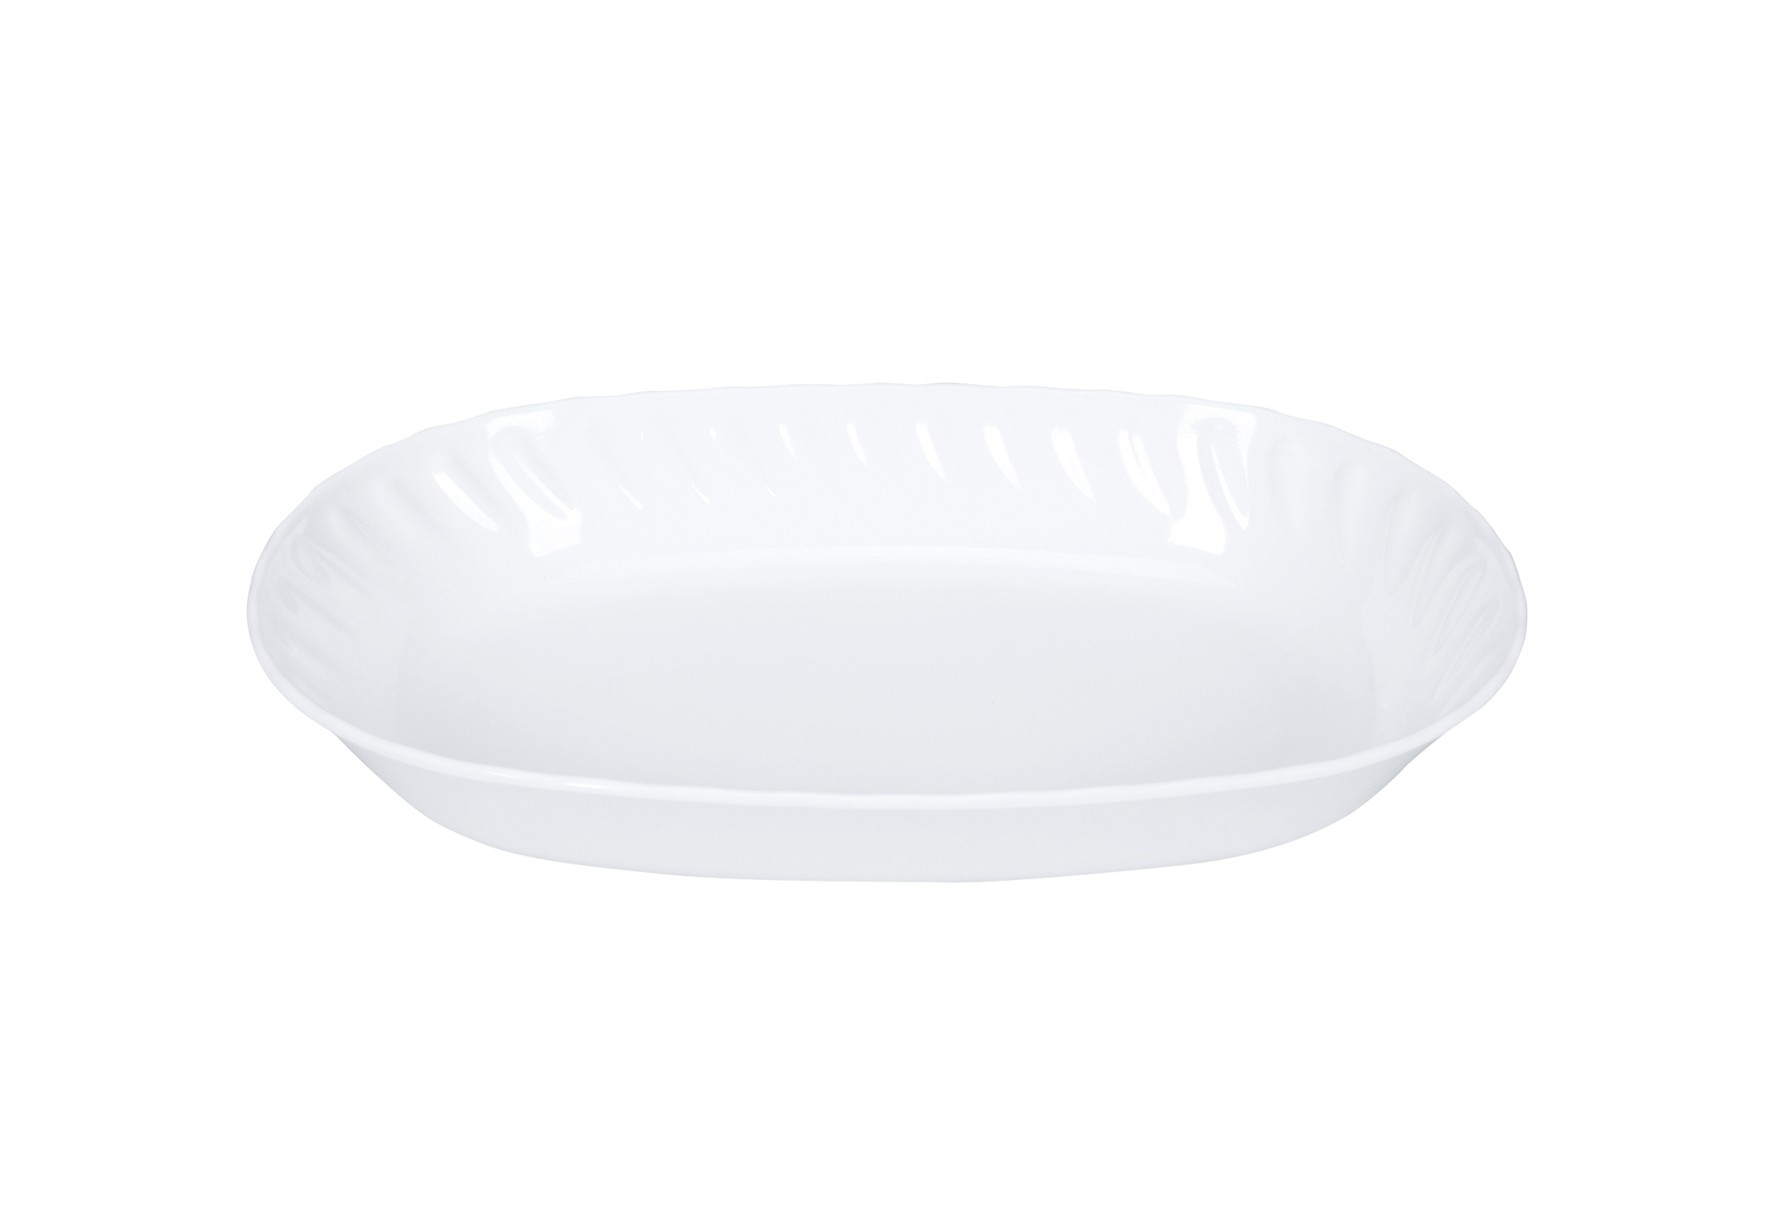 Saladeira Oval Melamine Branca 30cm - YAZI